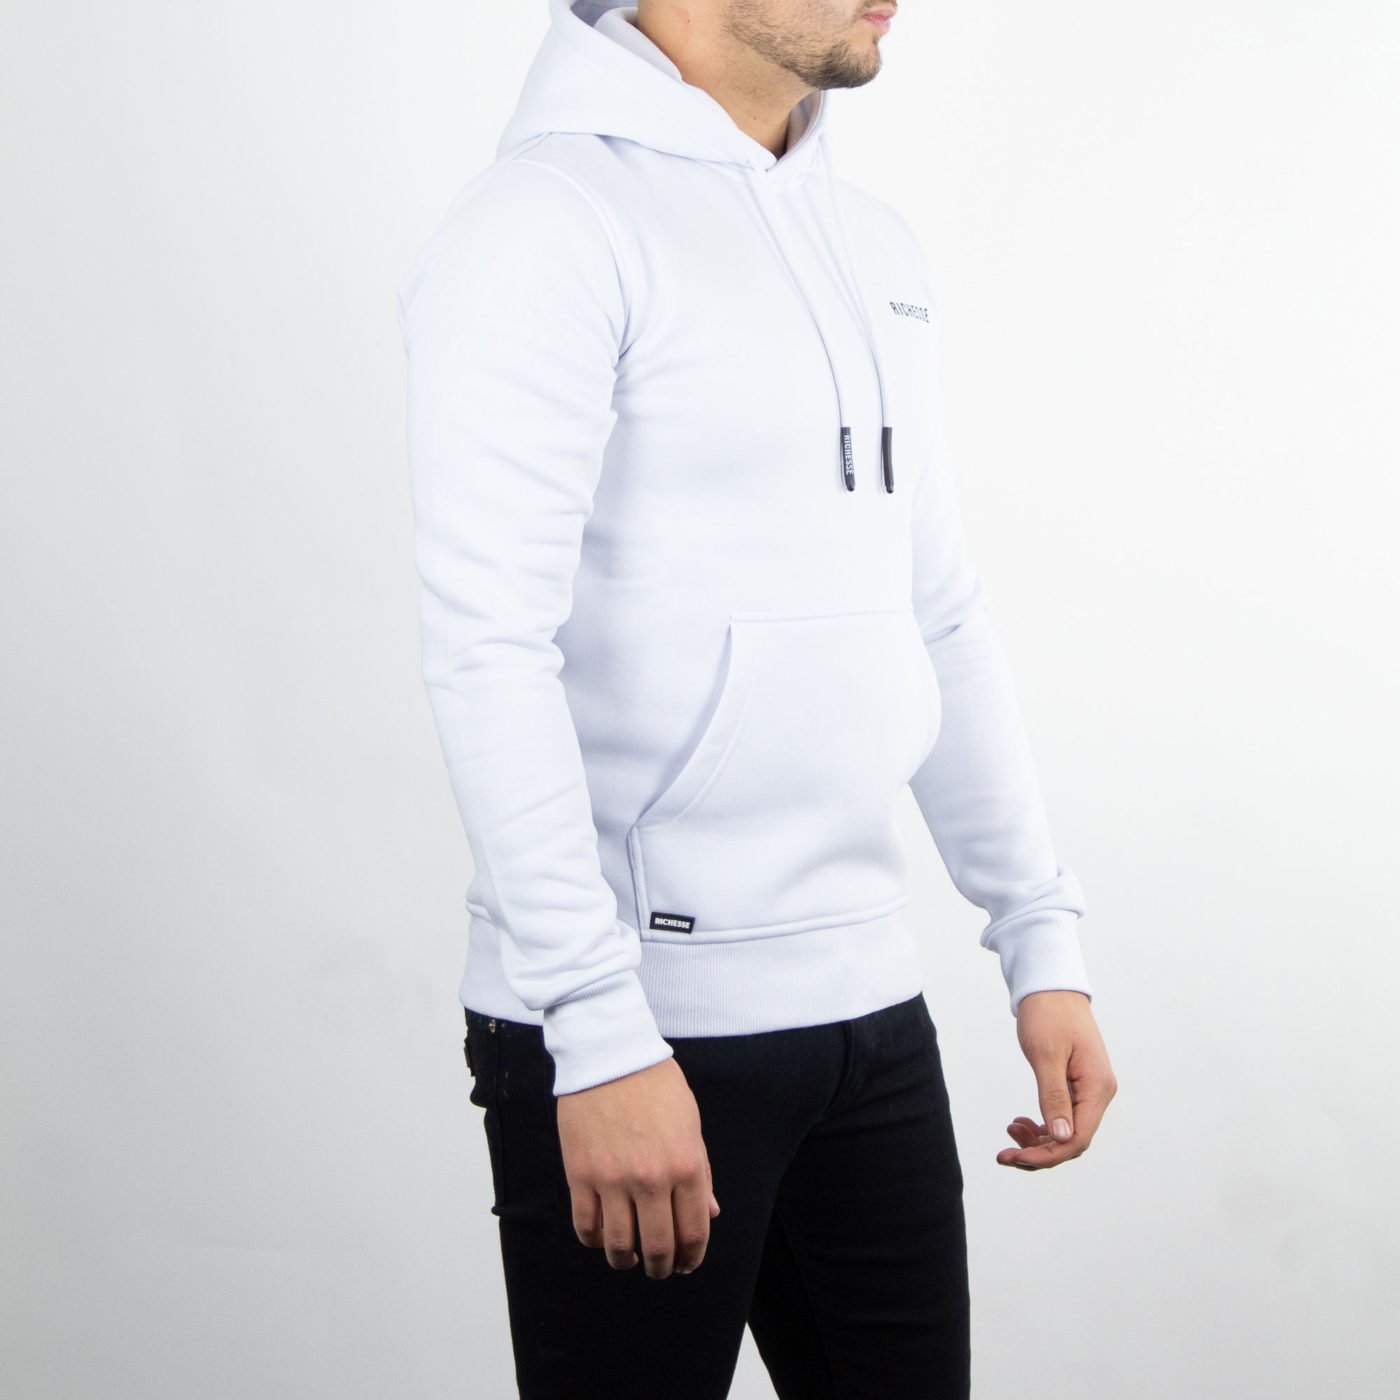 Richesse-Brand-Back-White-2